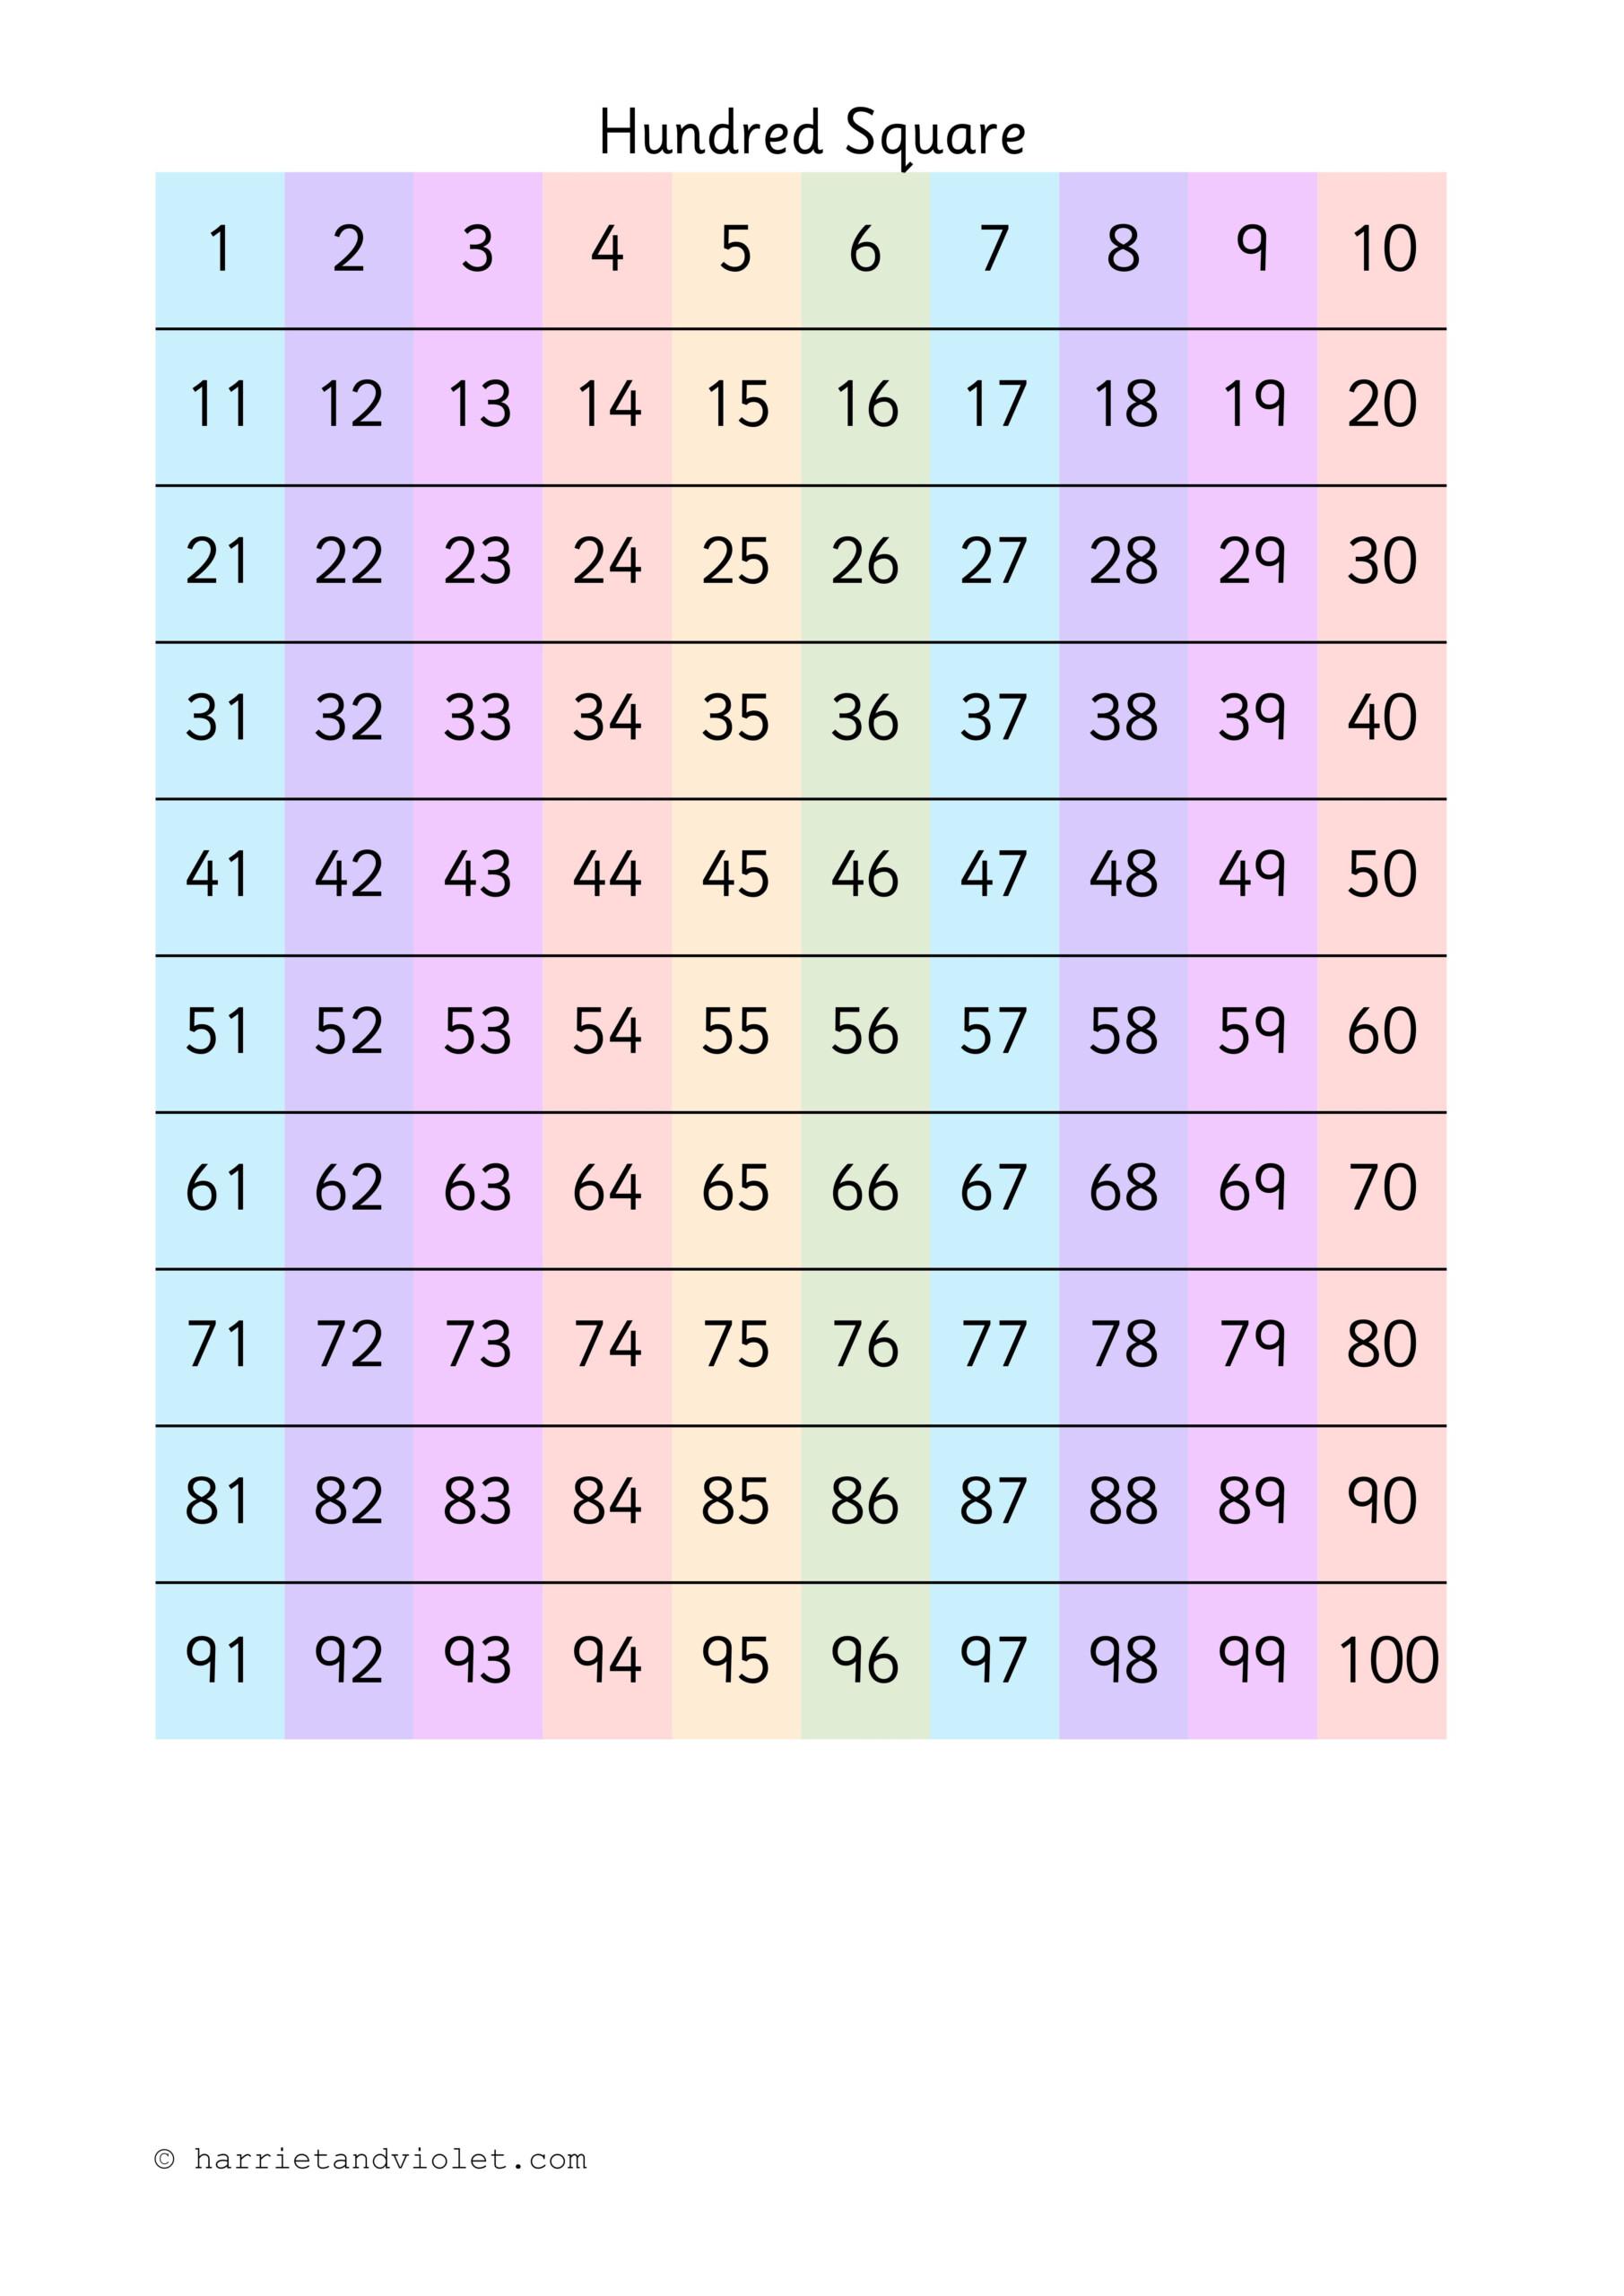 Hundred Square 0-100 A4 Portrait - Printable Teaching